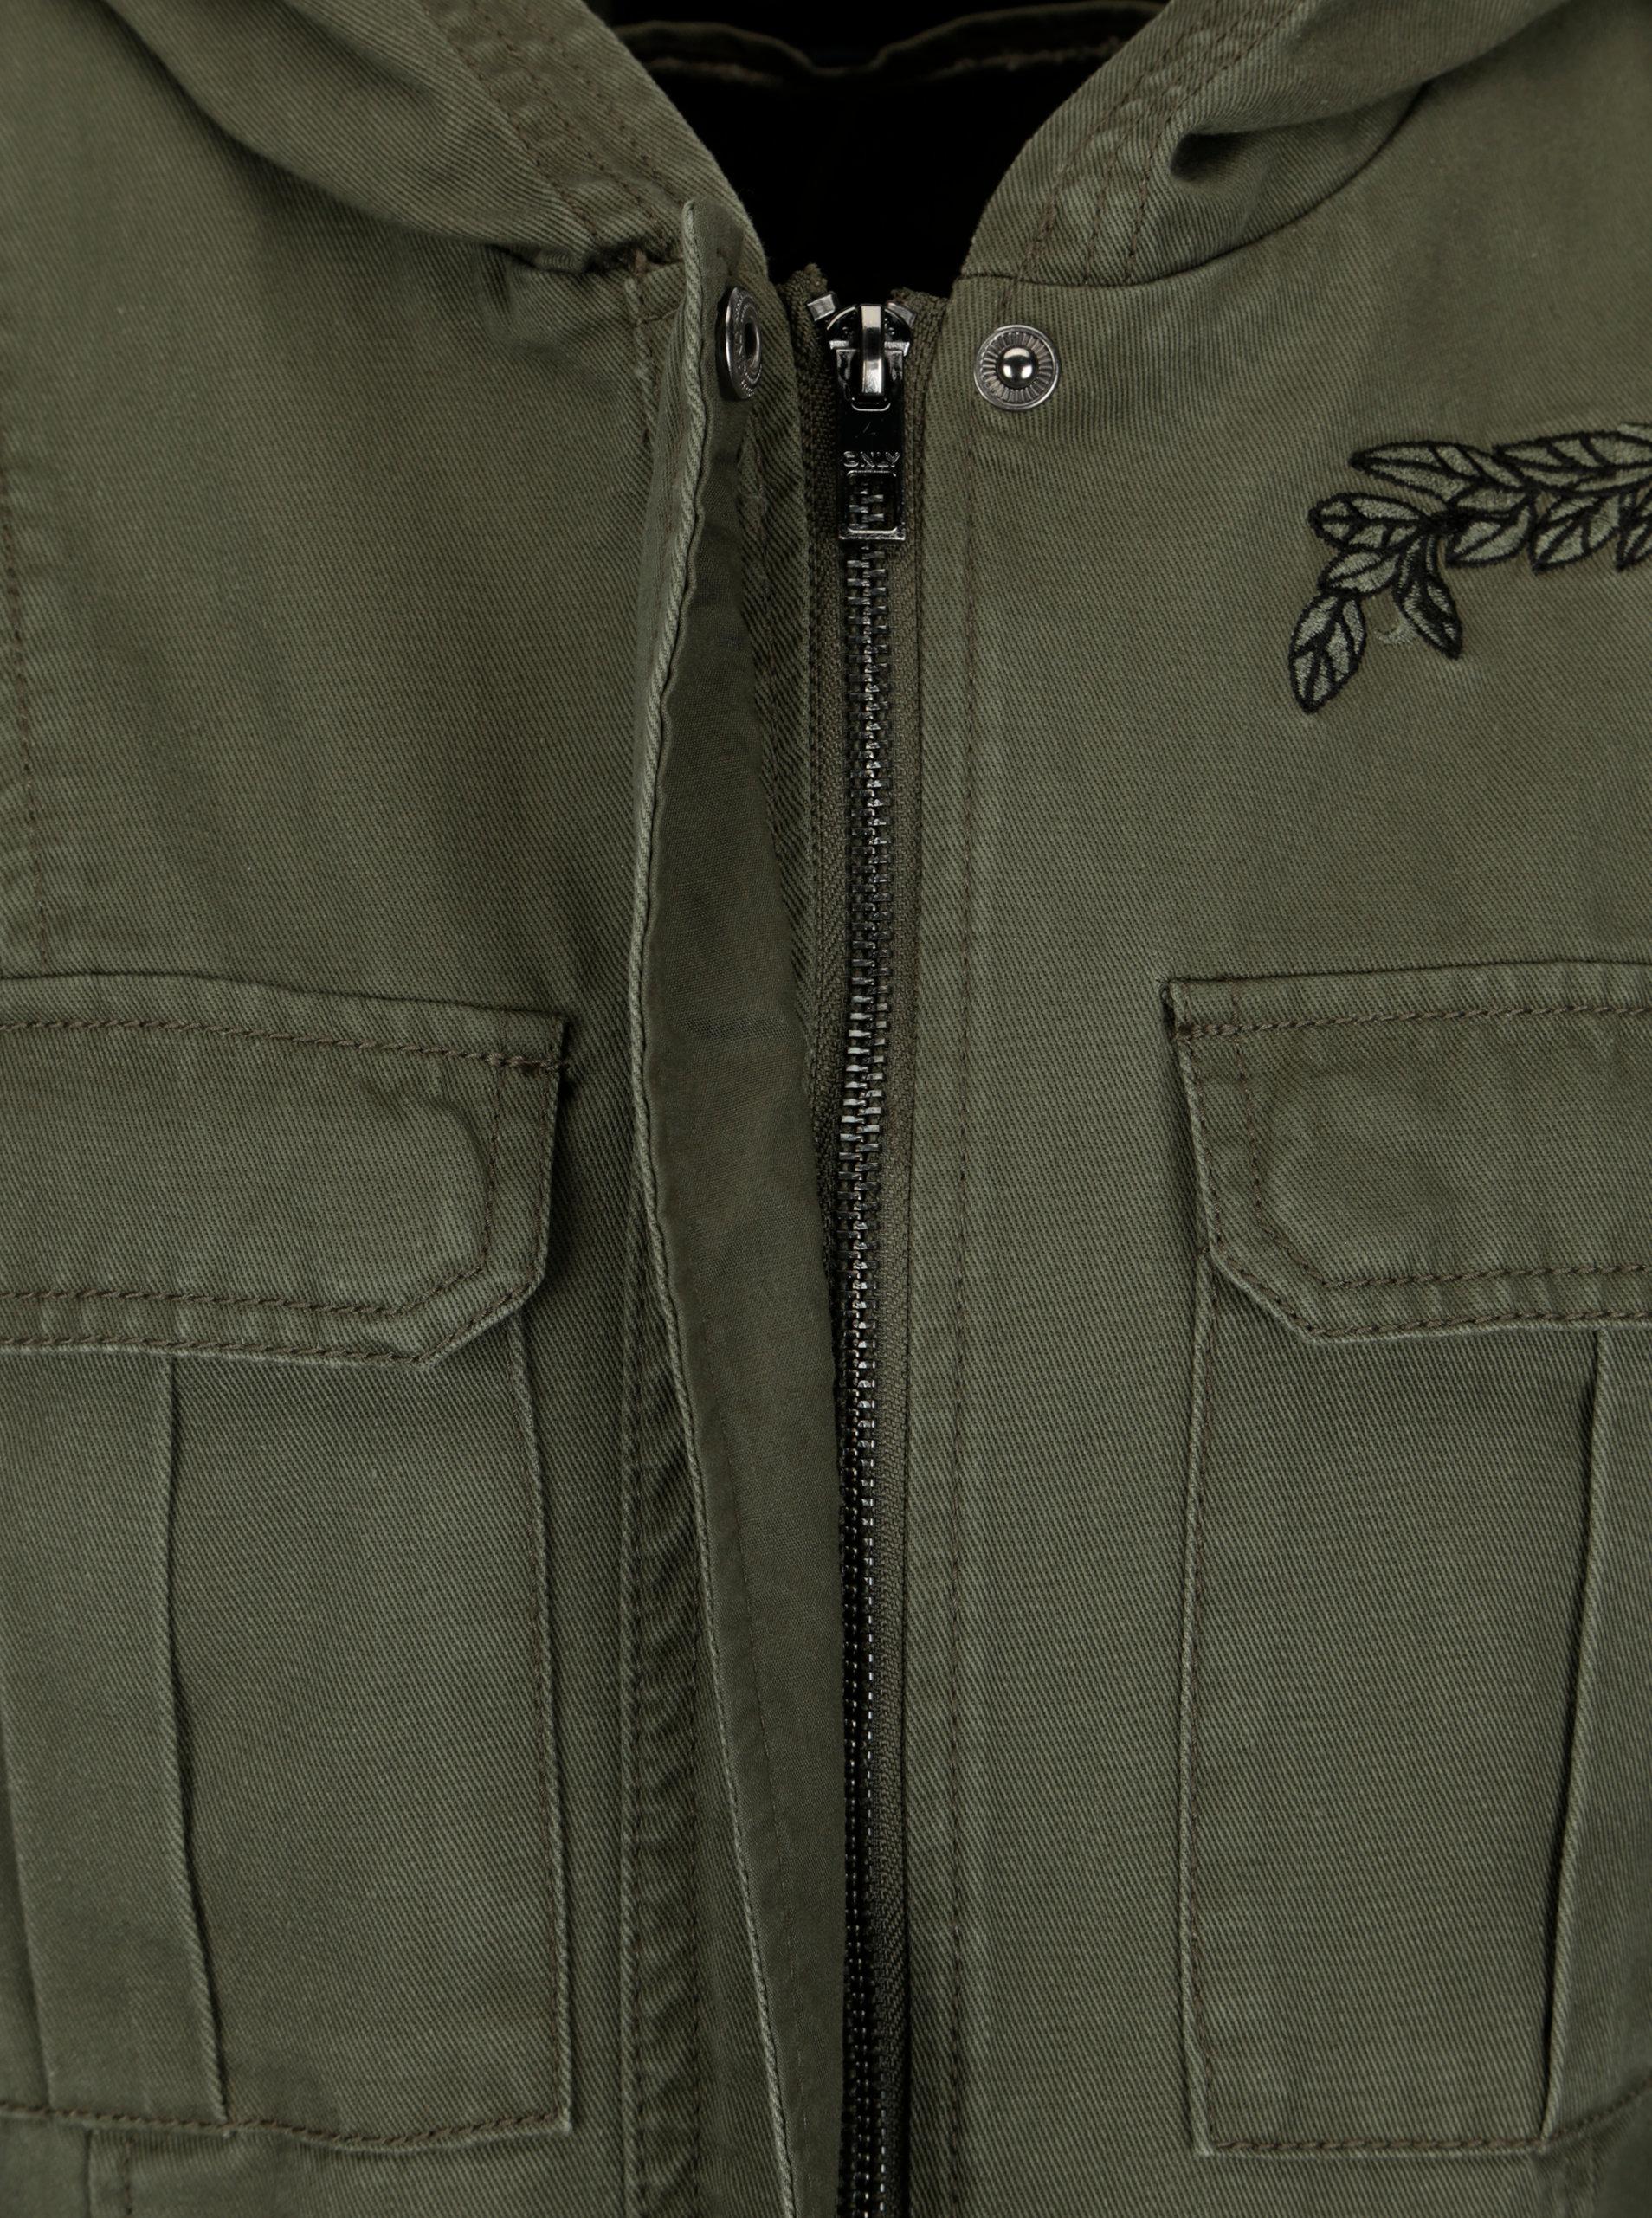 344be7bb2e9 Khaki bunda s kapsami a nášivkami ONLY New Becca ...